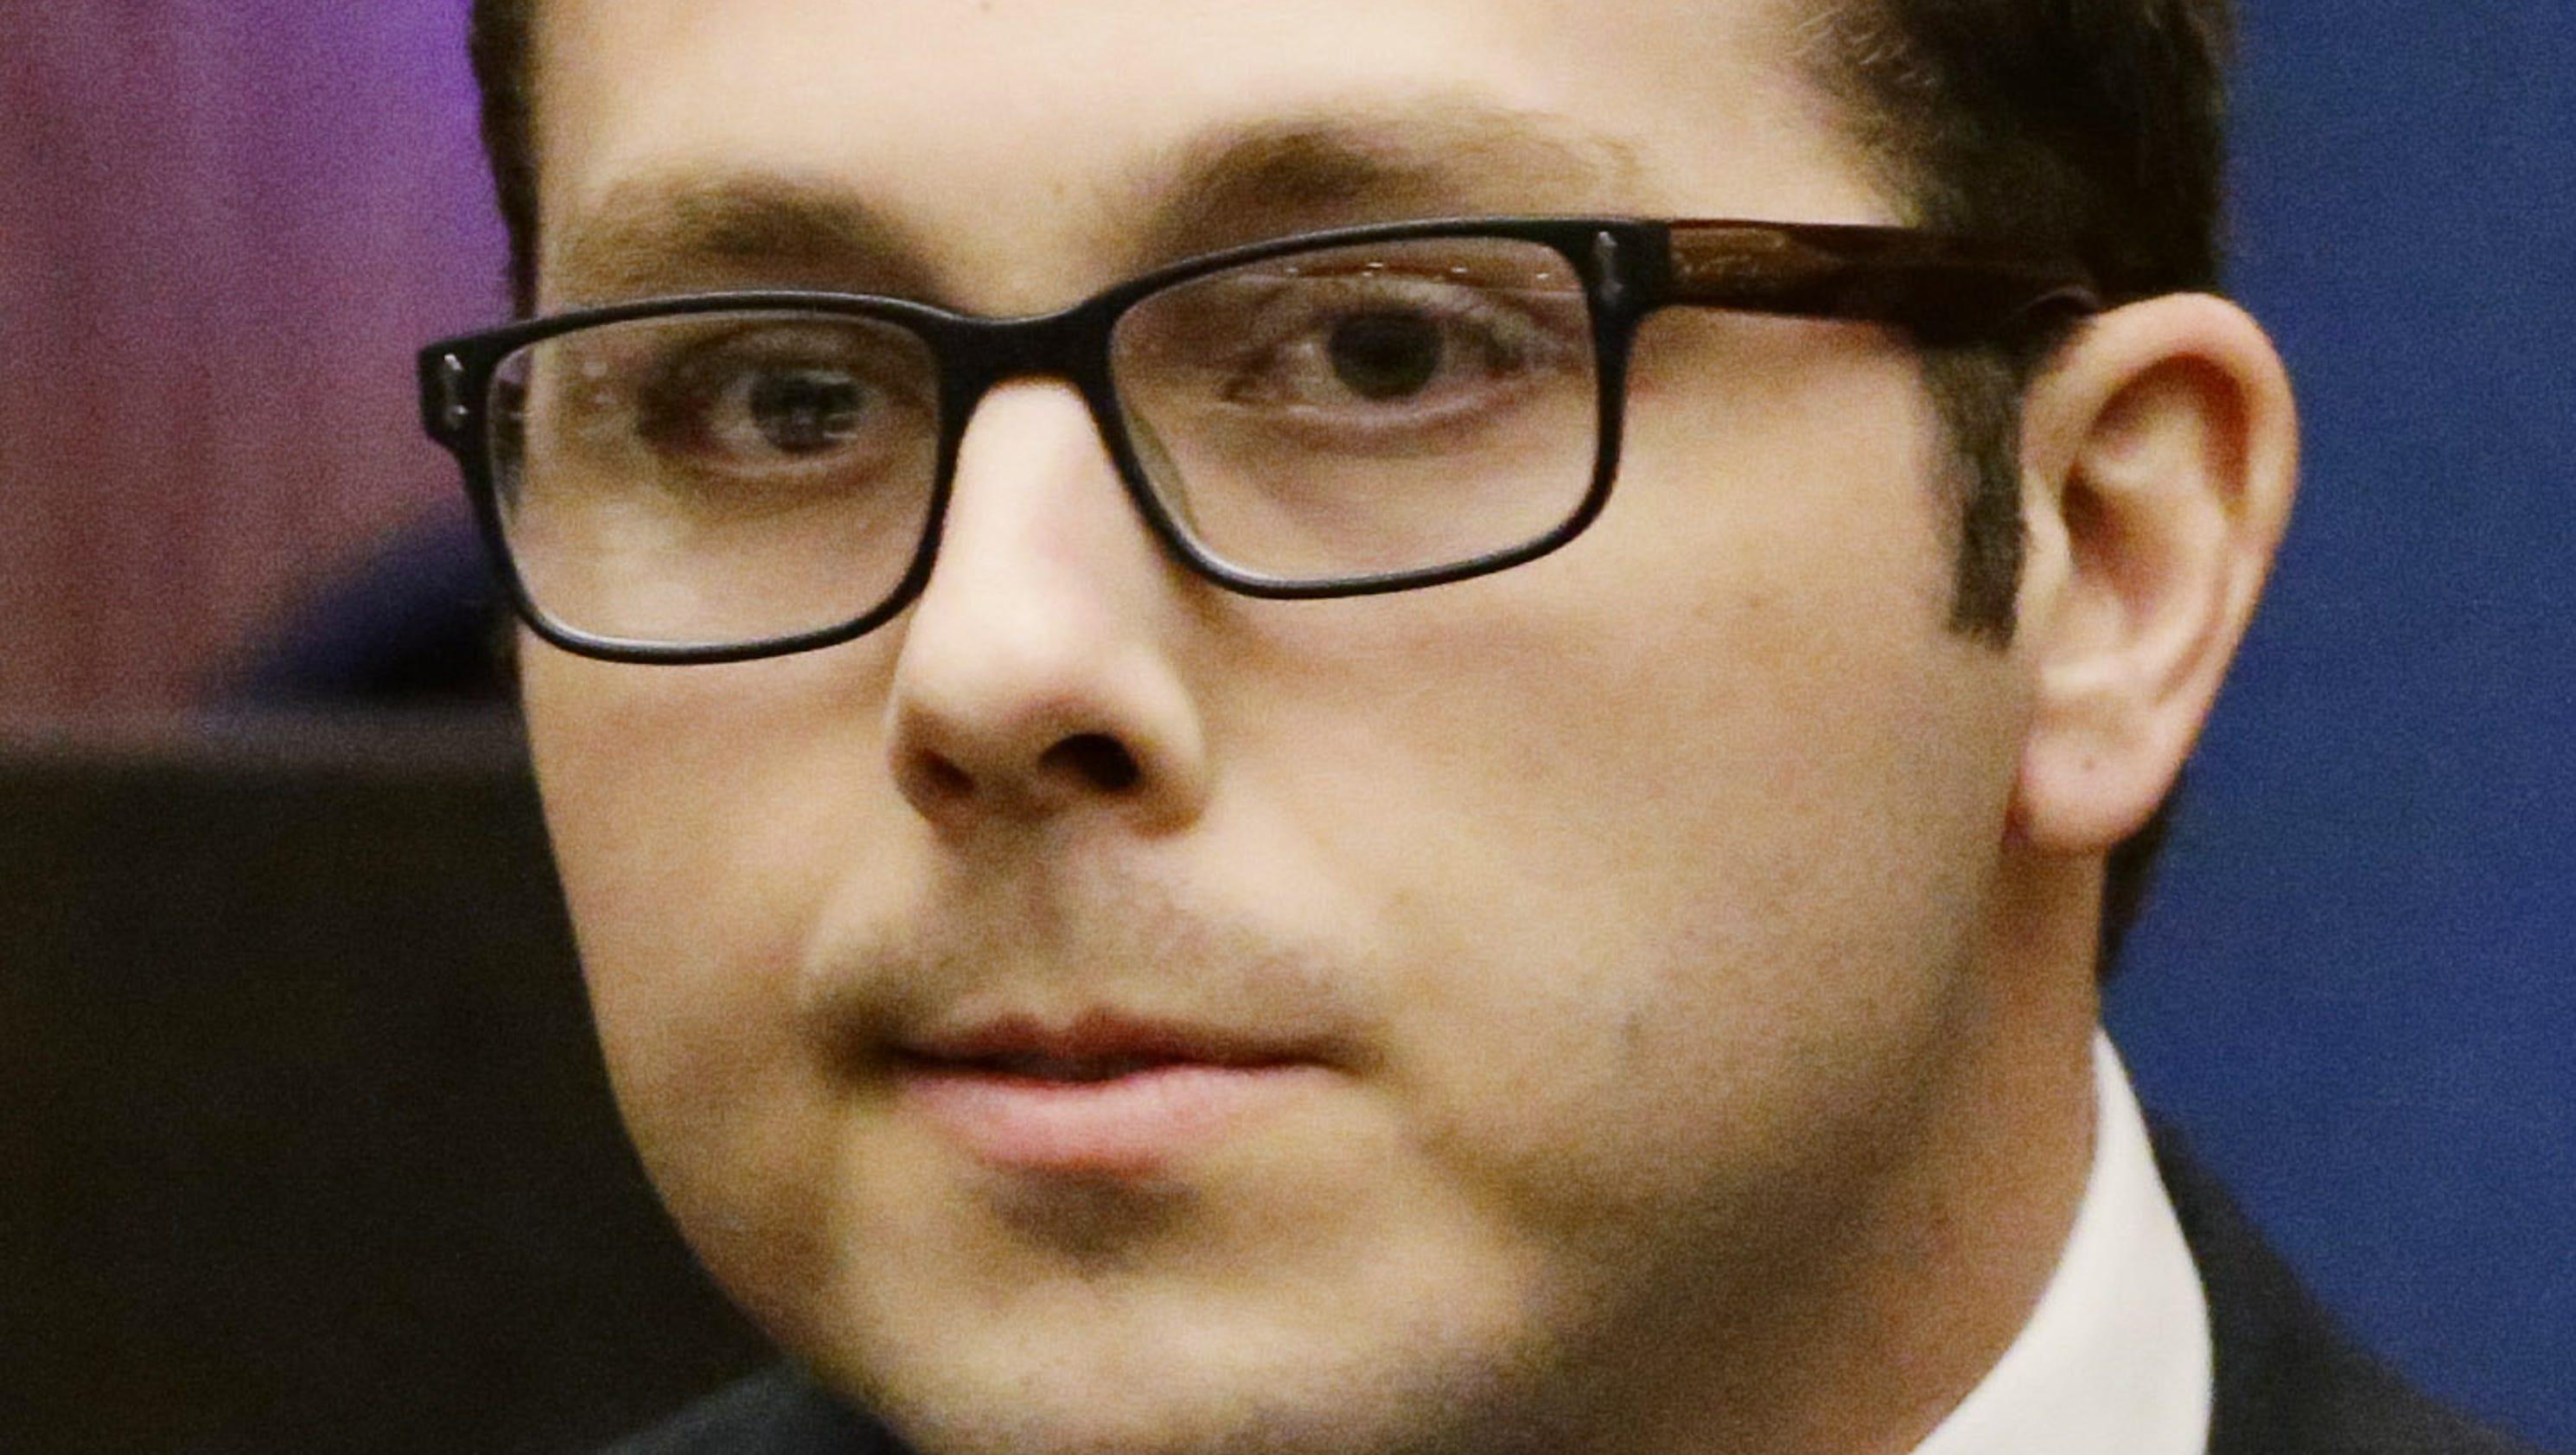 Daniel Shaver Family >> Daniel Shaver shooting: Former Arizona officer found not guilty